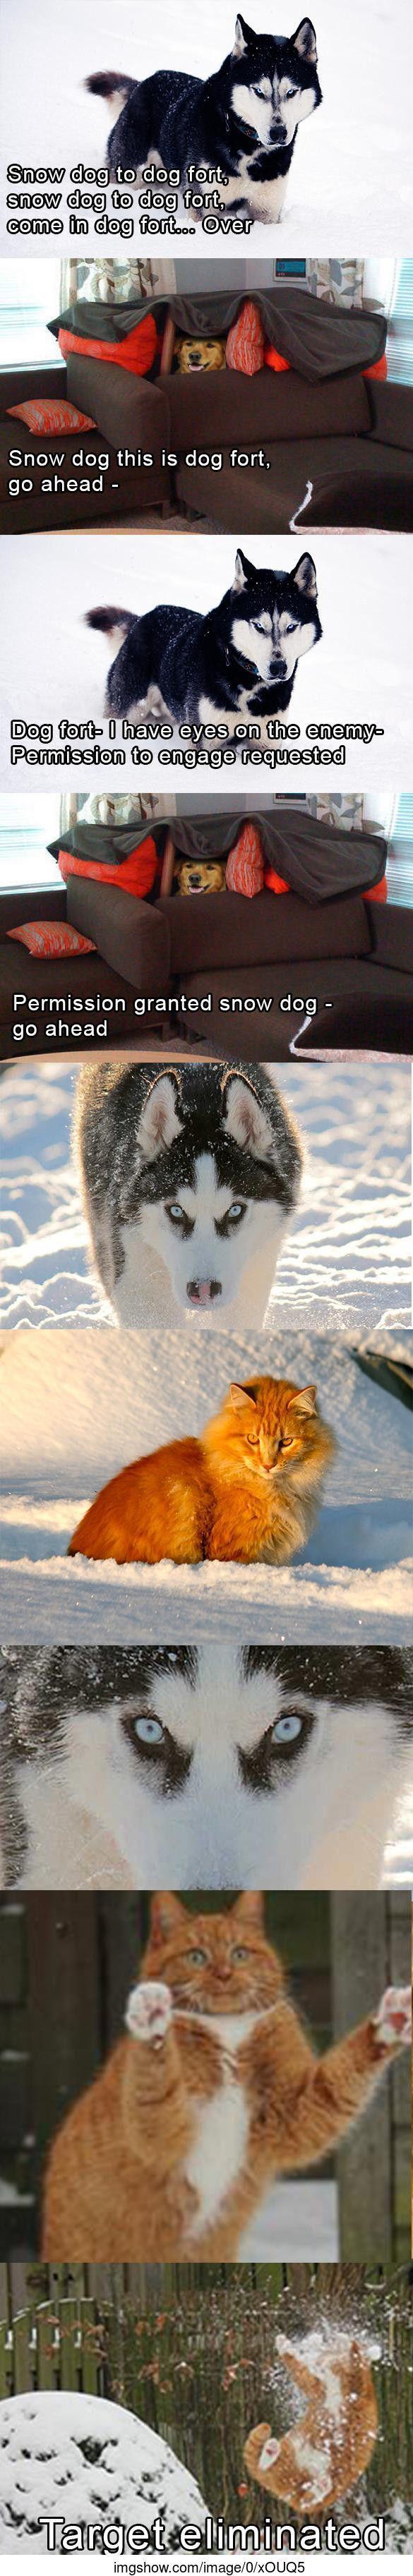 #animals #humor #funny #lol #captions